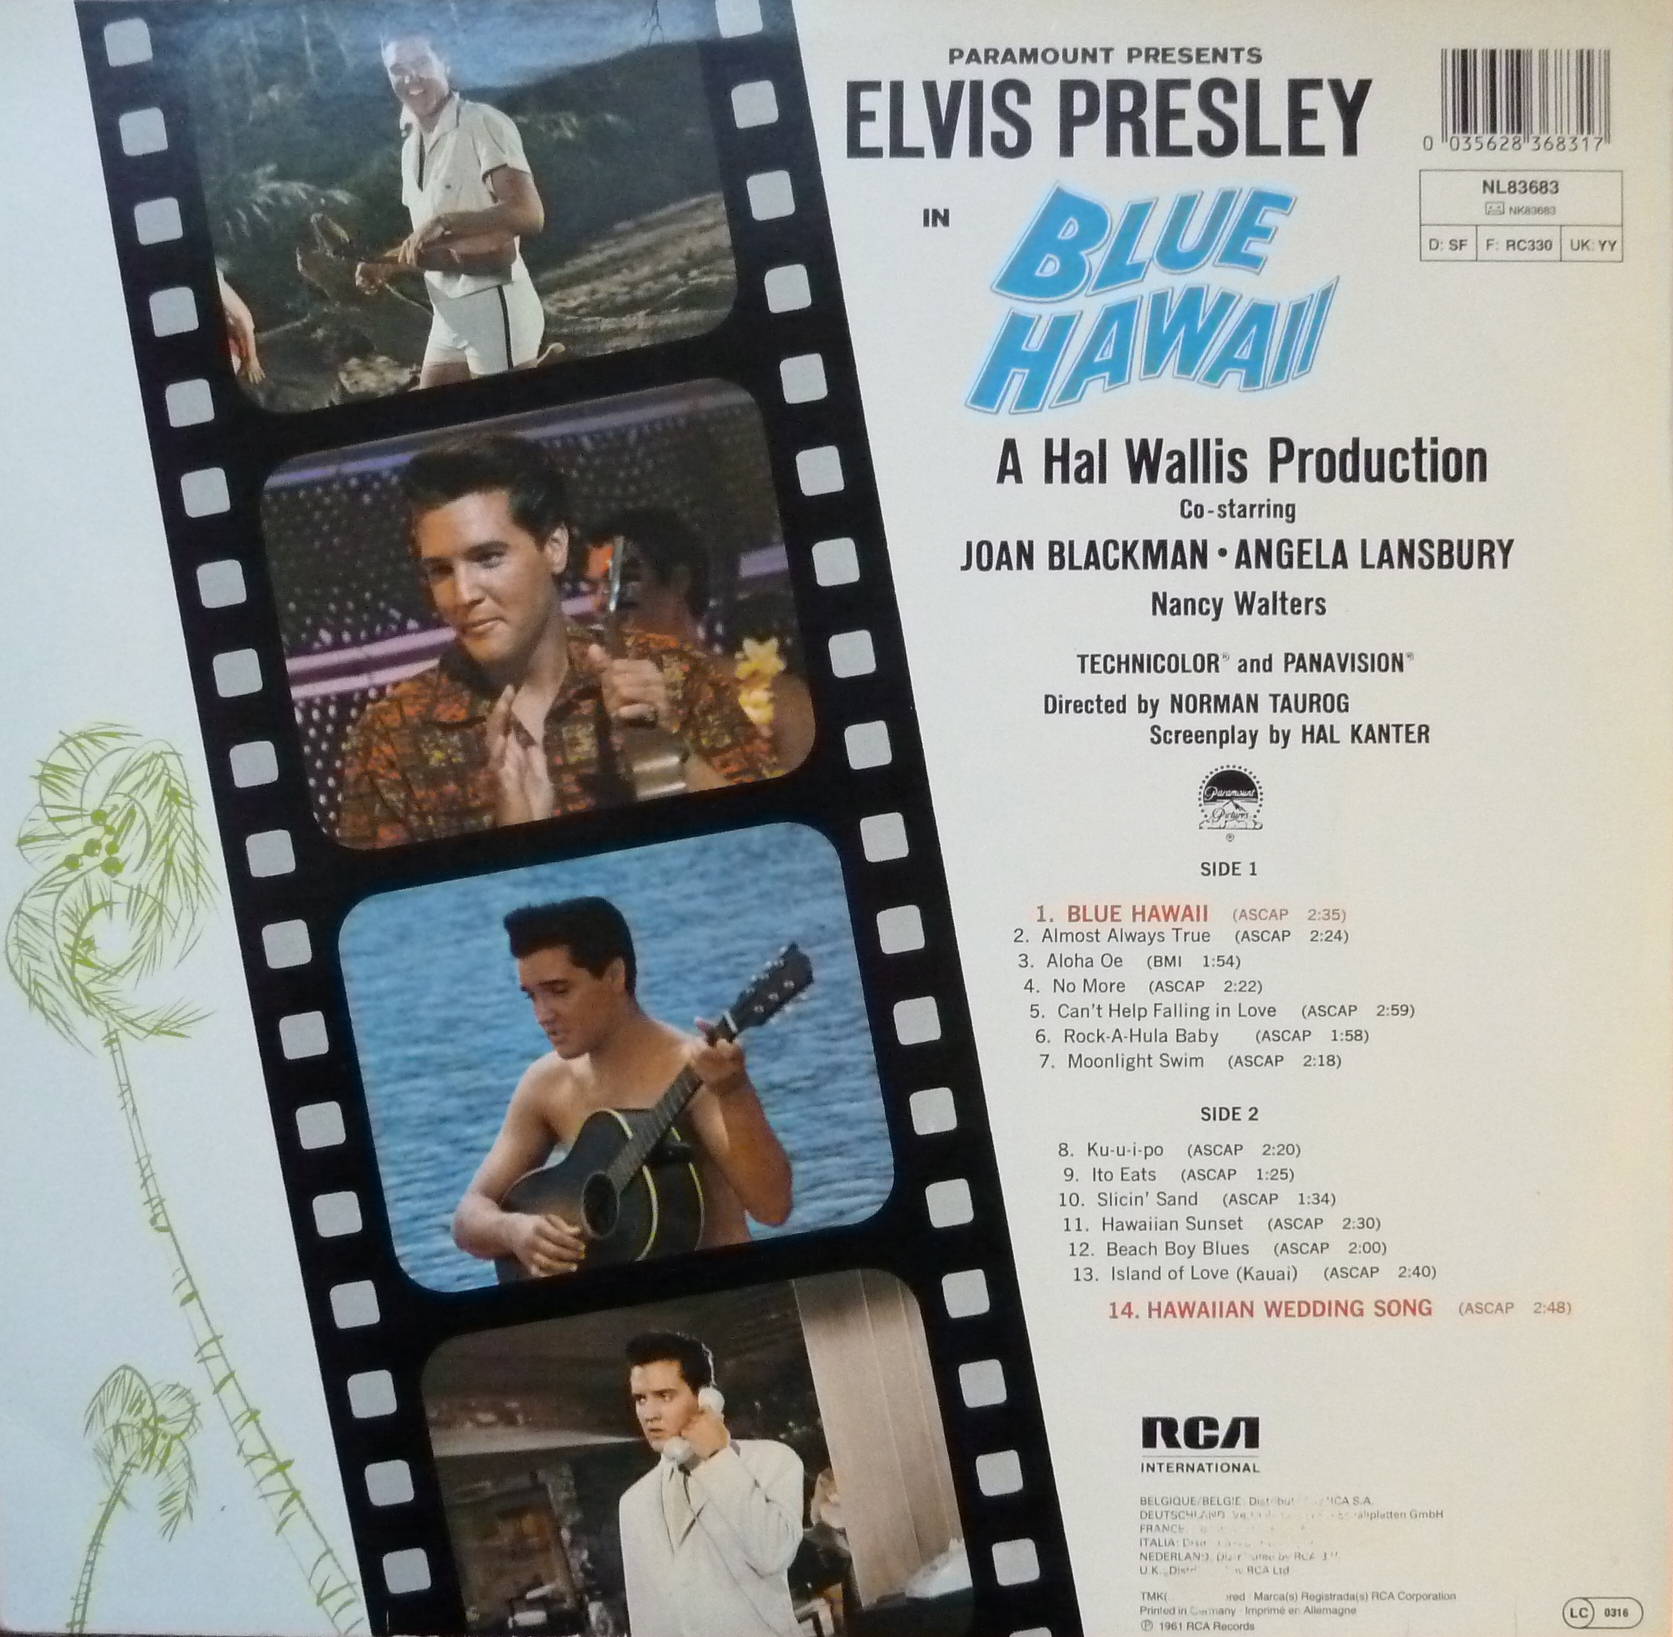 BLUE HAWAII Bluehawaii_1984_rckseqck3j